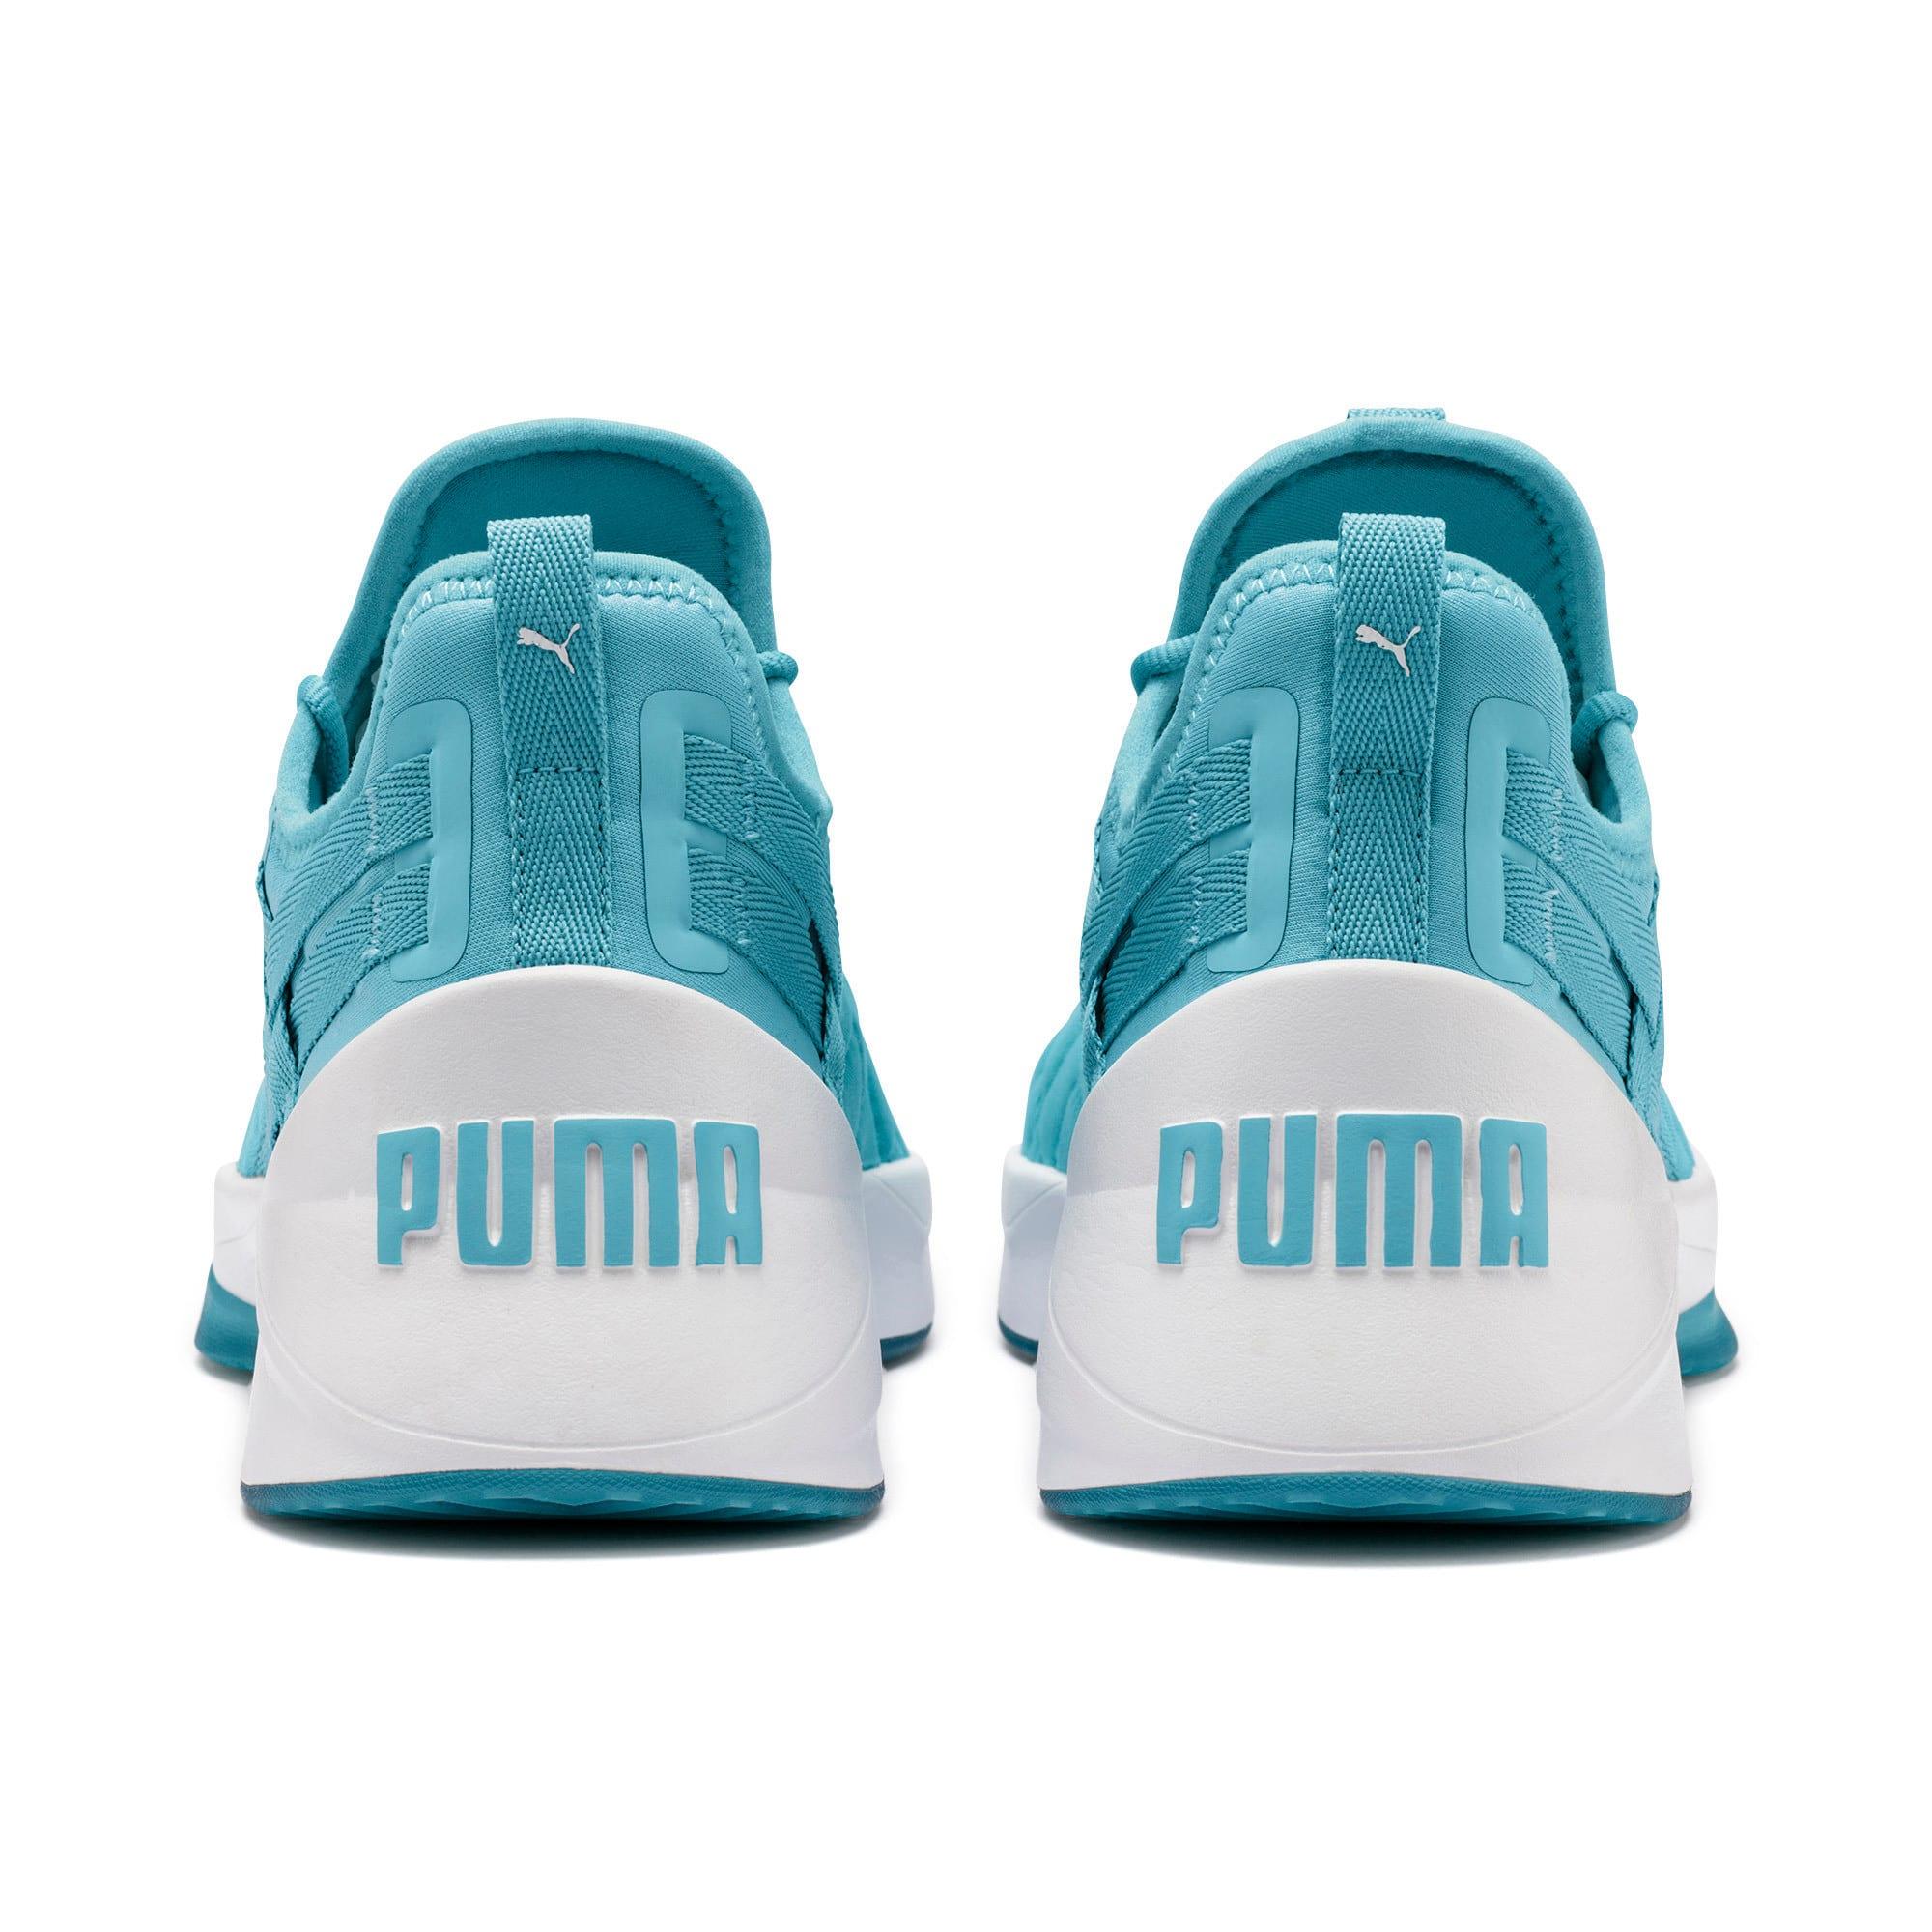 Thumbnail 4 of Jaab XT Quilt Women's Training Shoes, Milky Blue-Puma White, medium